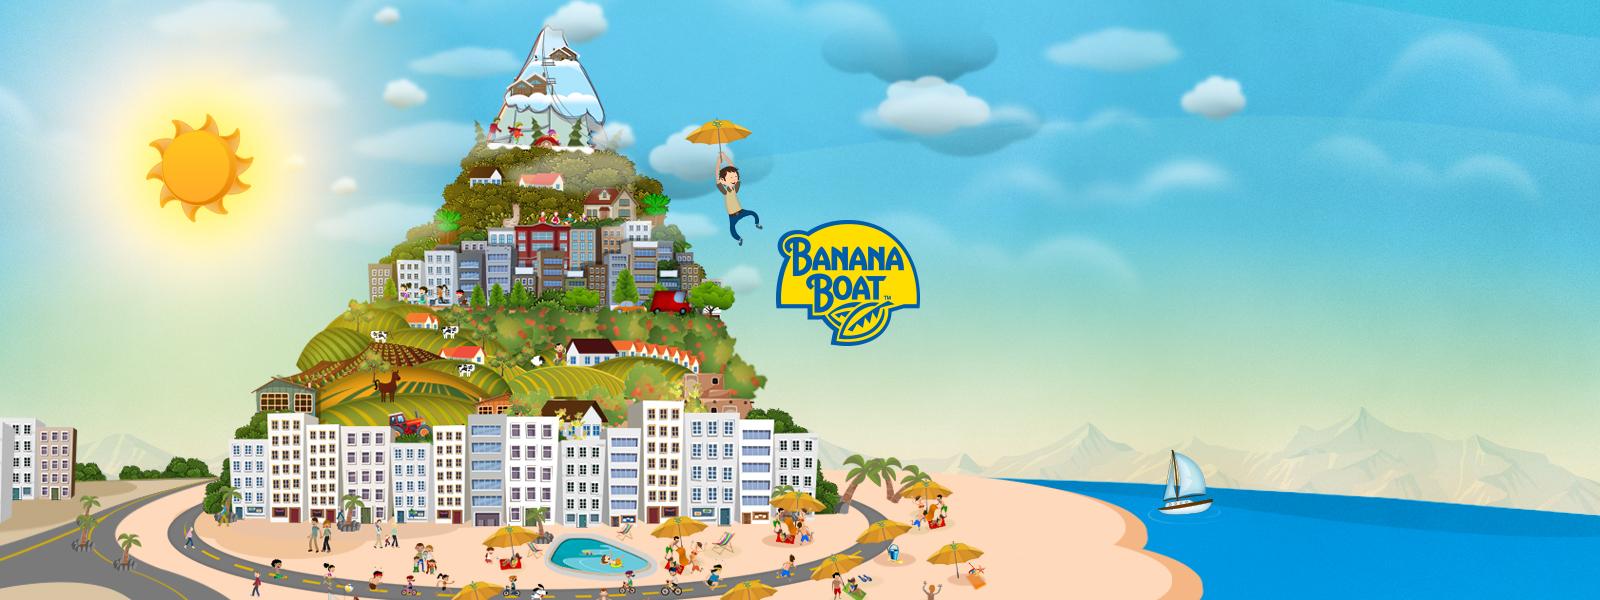 Banana Boat Latam